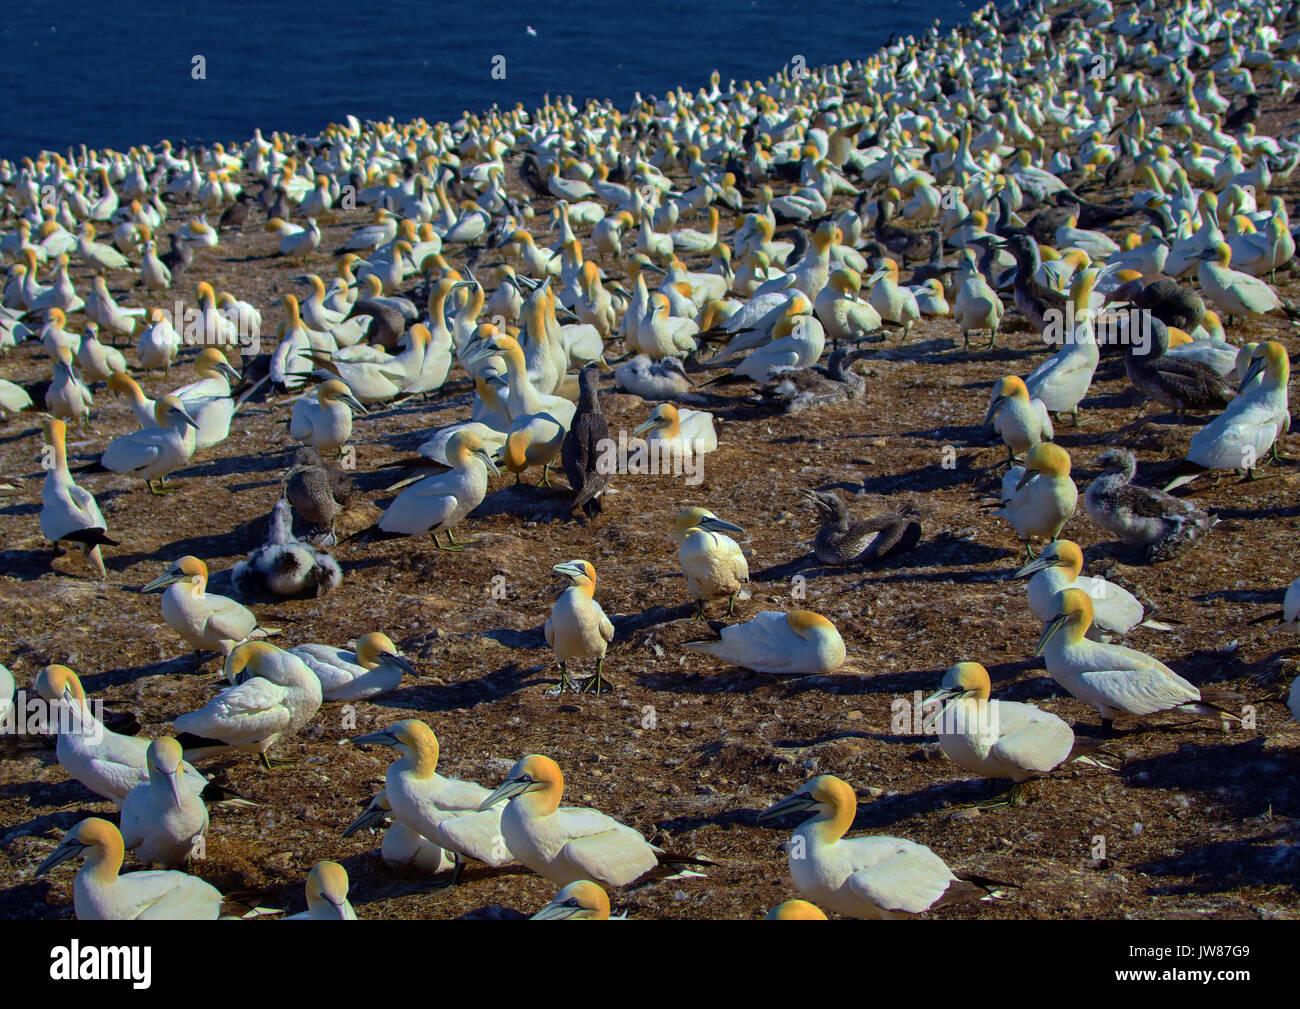 America, Canada, Quebec, Gaspésie, Percé area, The Bonaventure island andl park, the gannets birds - Stock Image